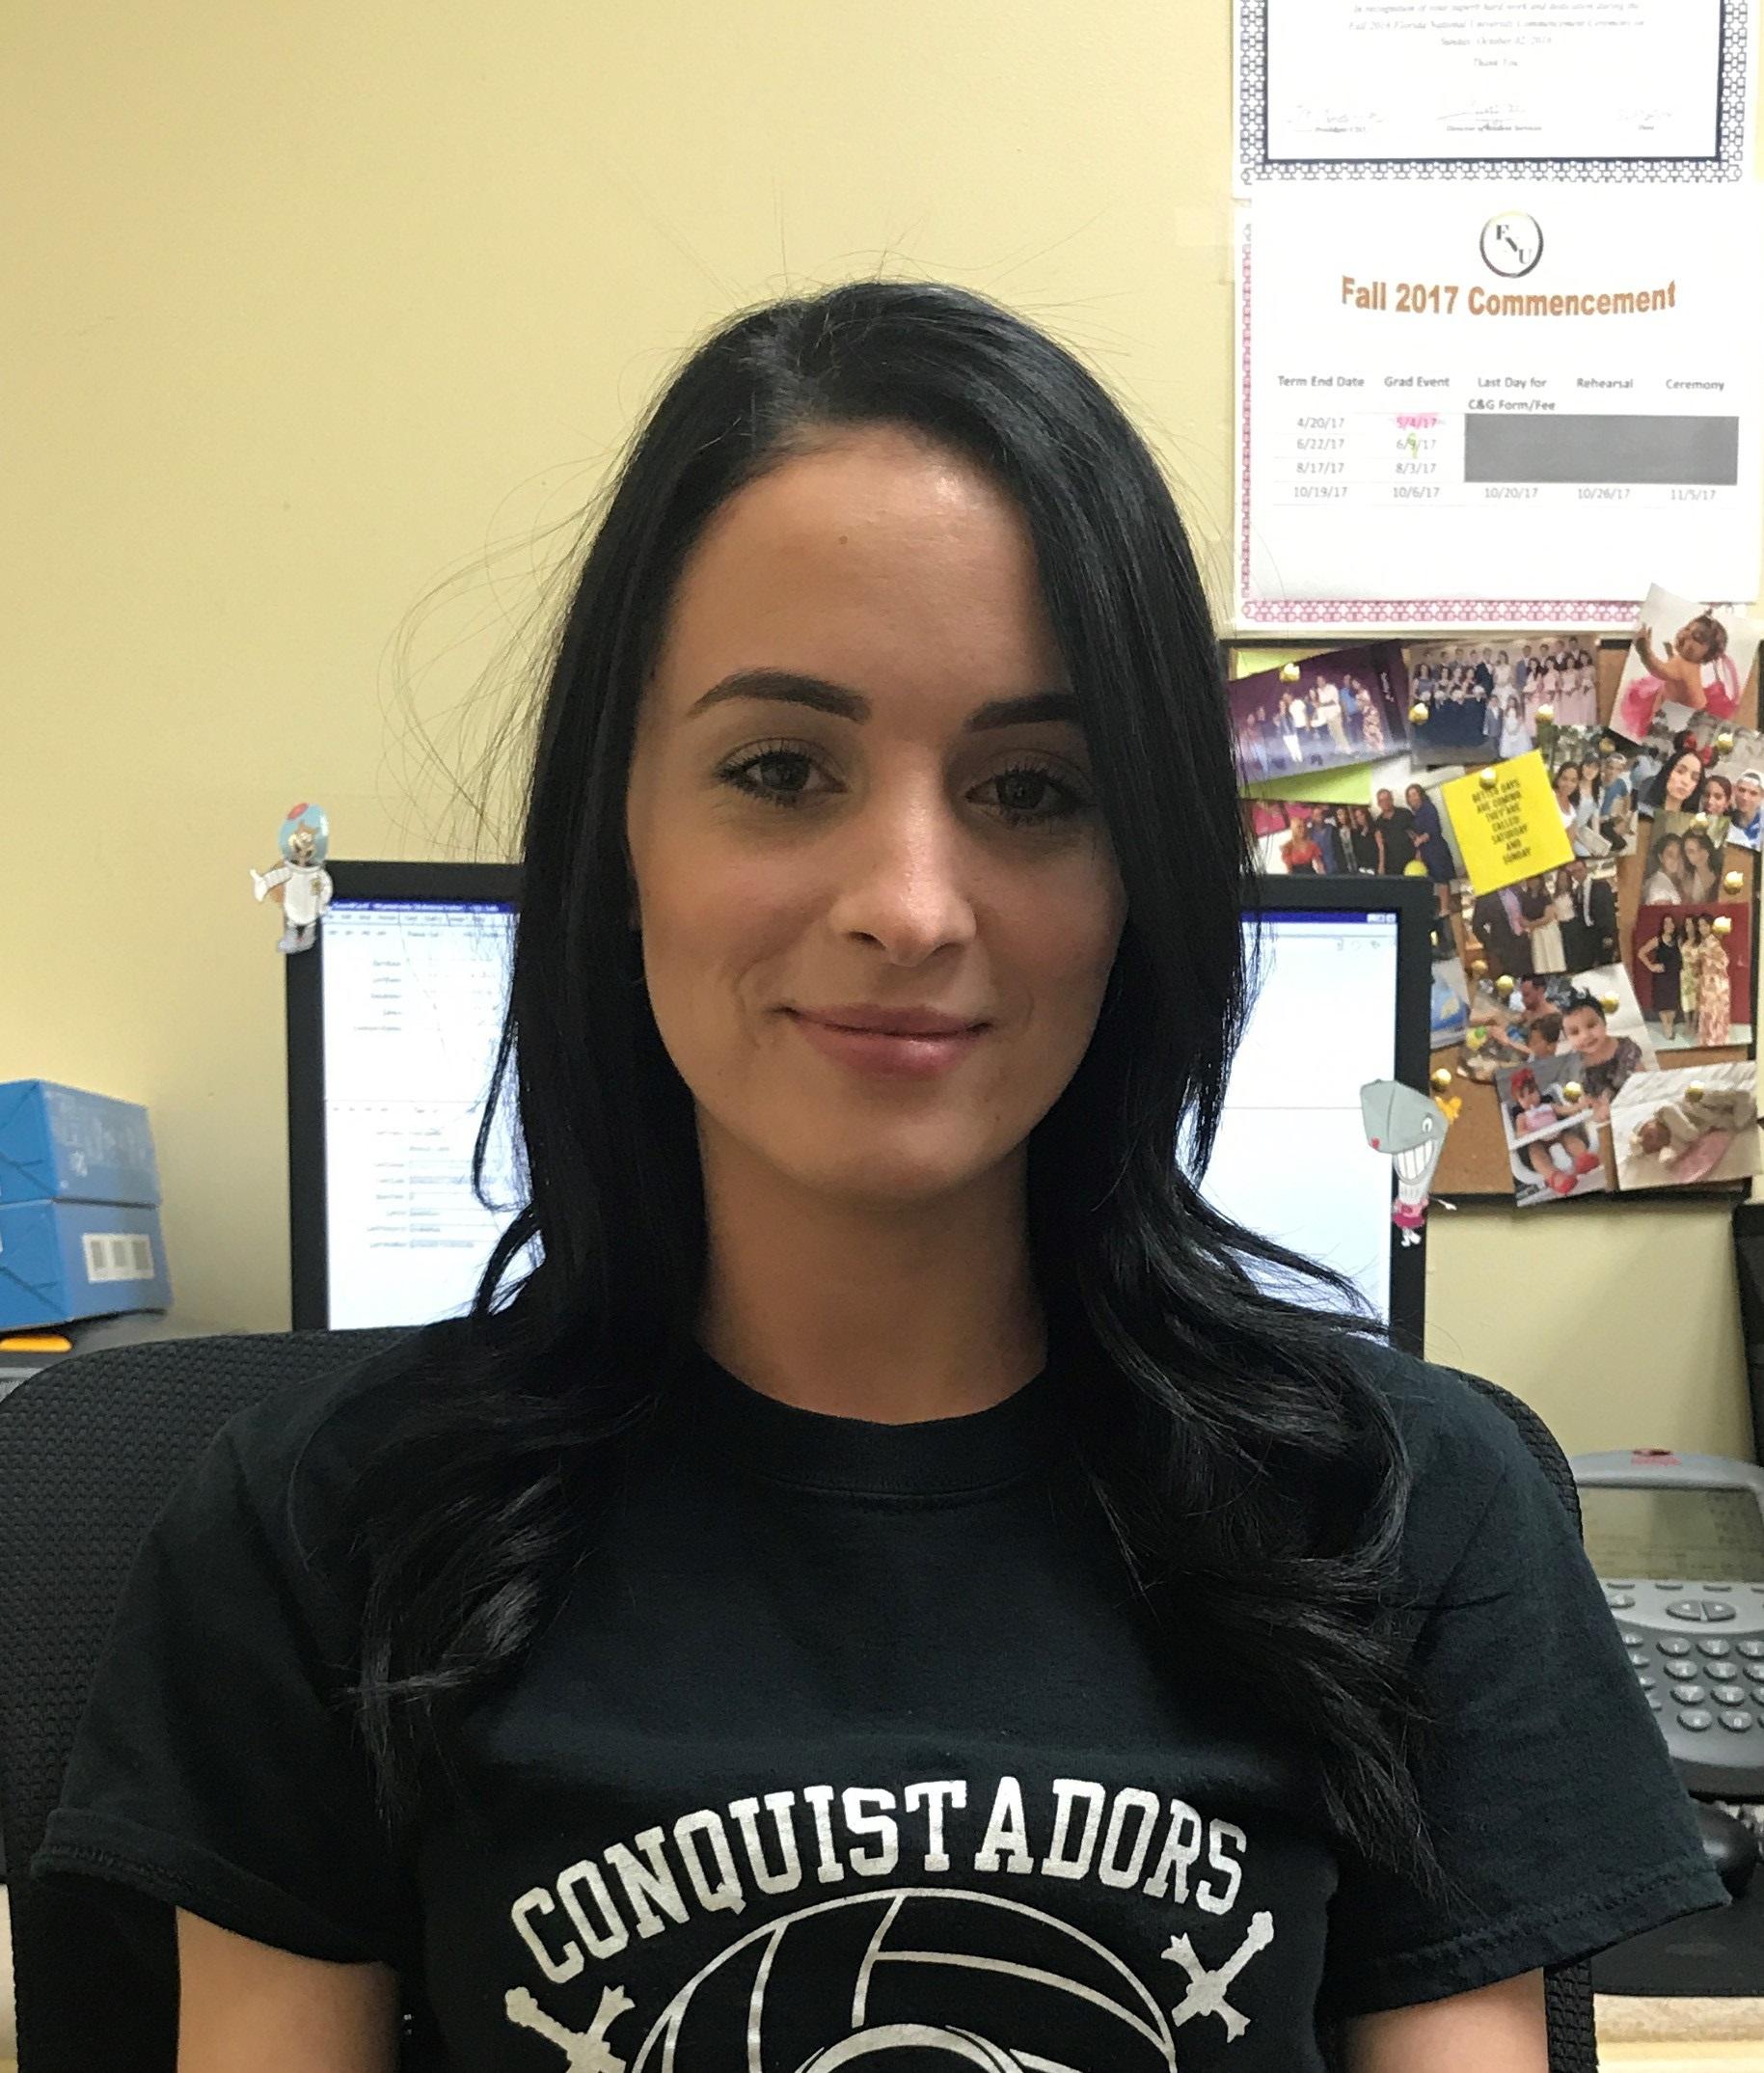 Yarlenis Gonzalez - Student Services Assistant